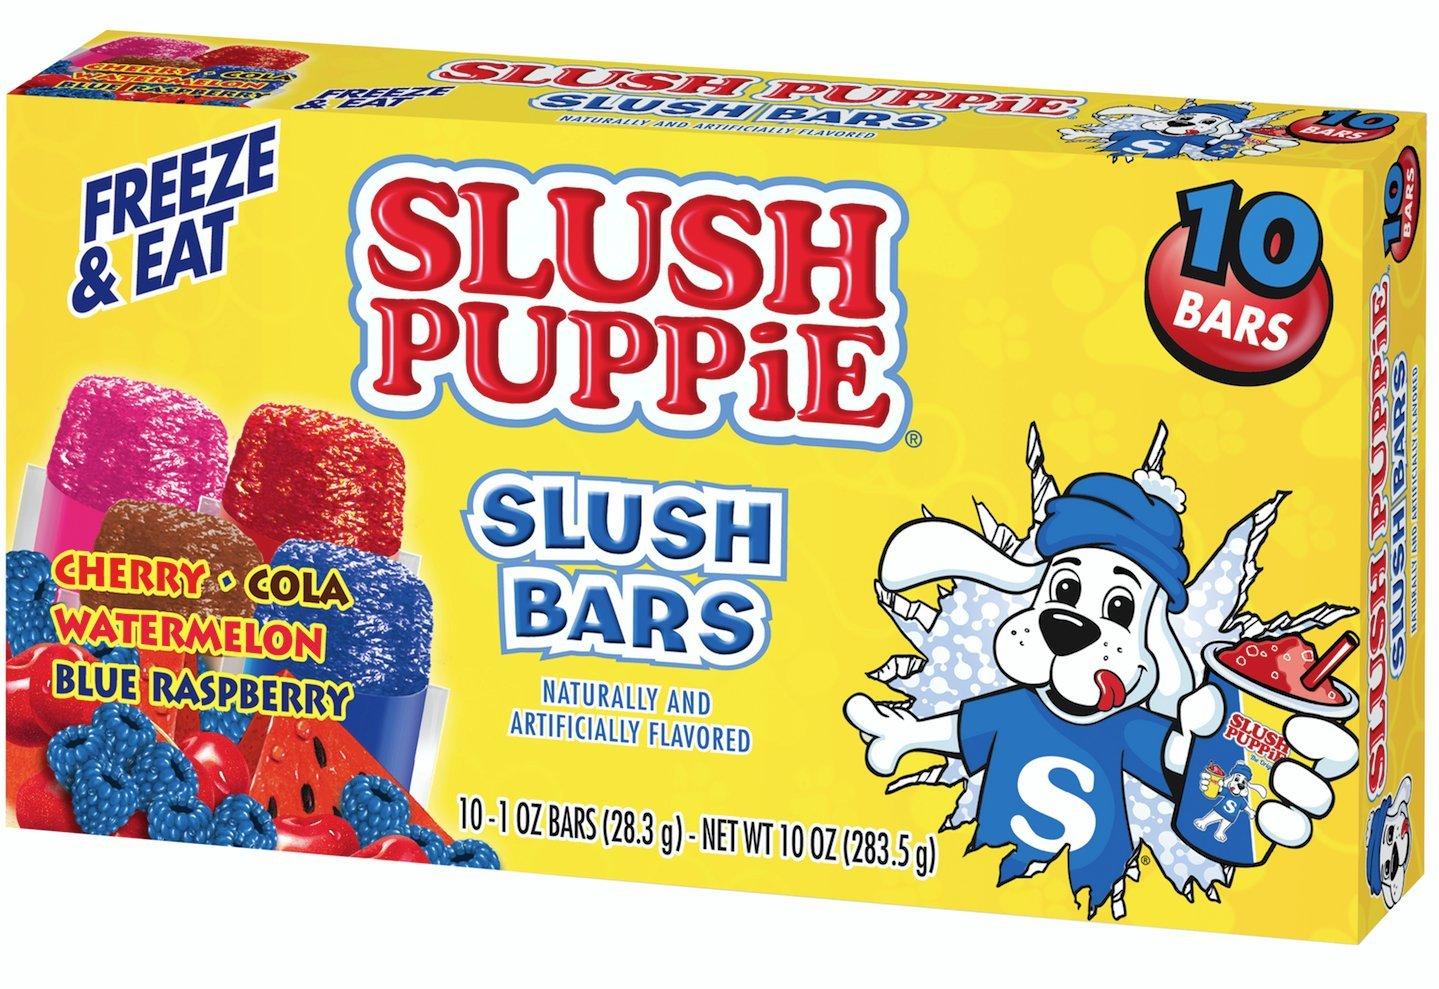 Slush Puppie Slush Bars, Assorted Flavors (12 Boxes, 10 - 1 oz bars per box)